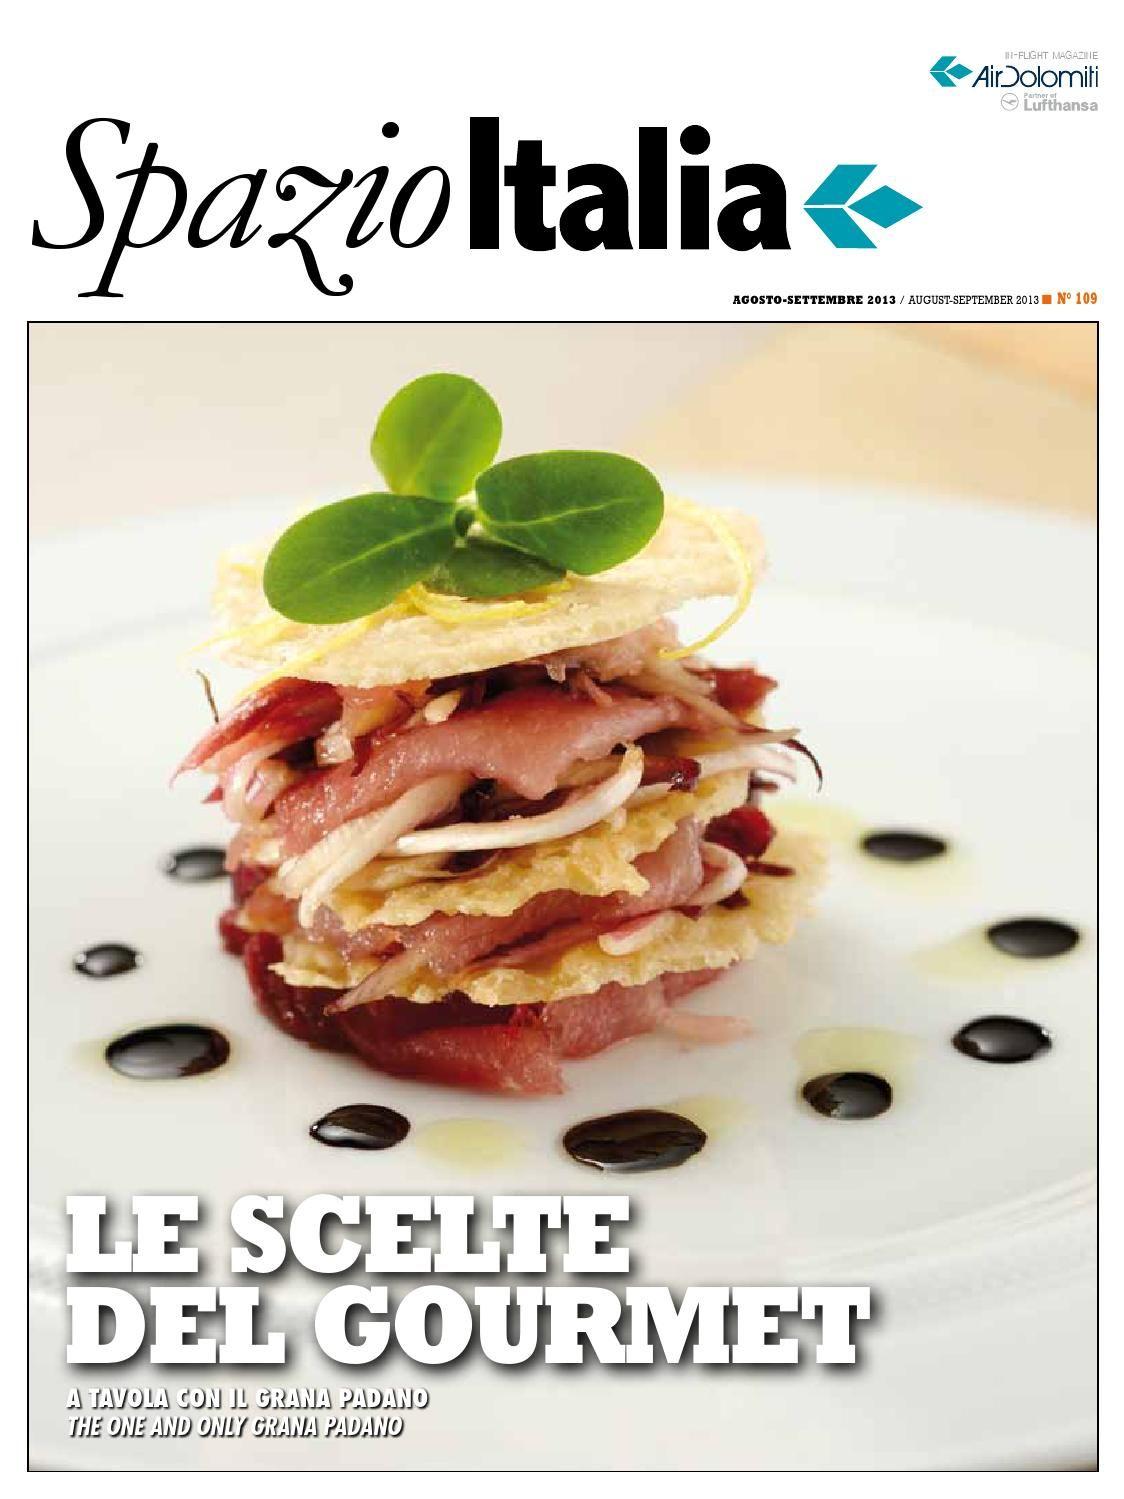 Spazio Italia Magazine no. 109  Here it is! The newest issue of #AirDolomiti #inflight #magazine #SpazioItalia - We hope you will enjoy reading and sharing it!